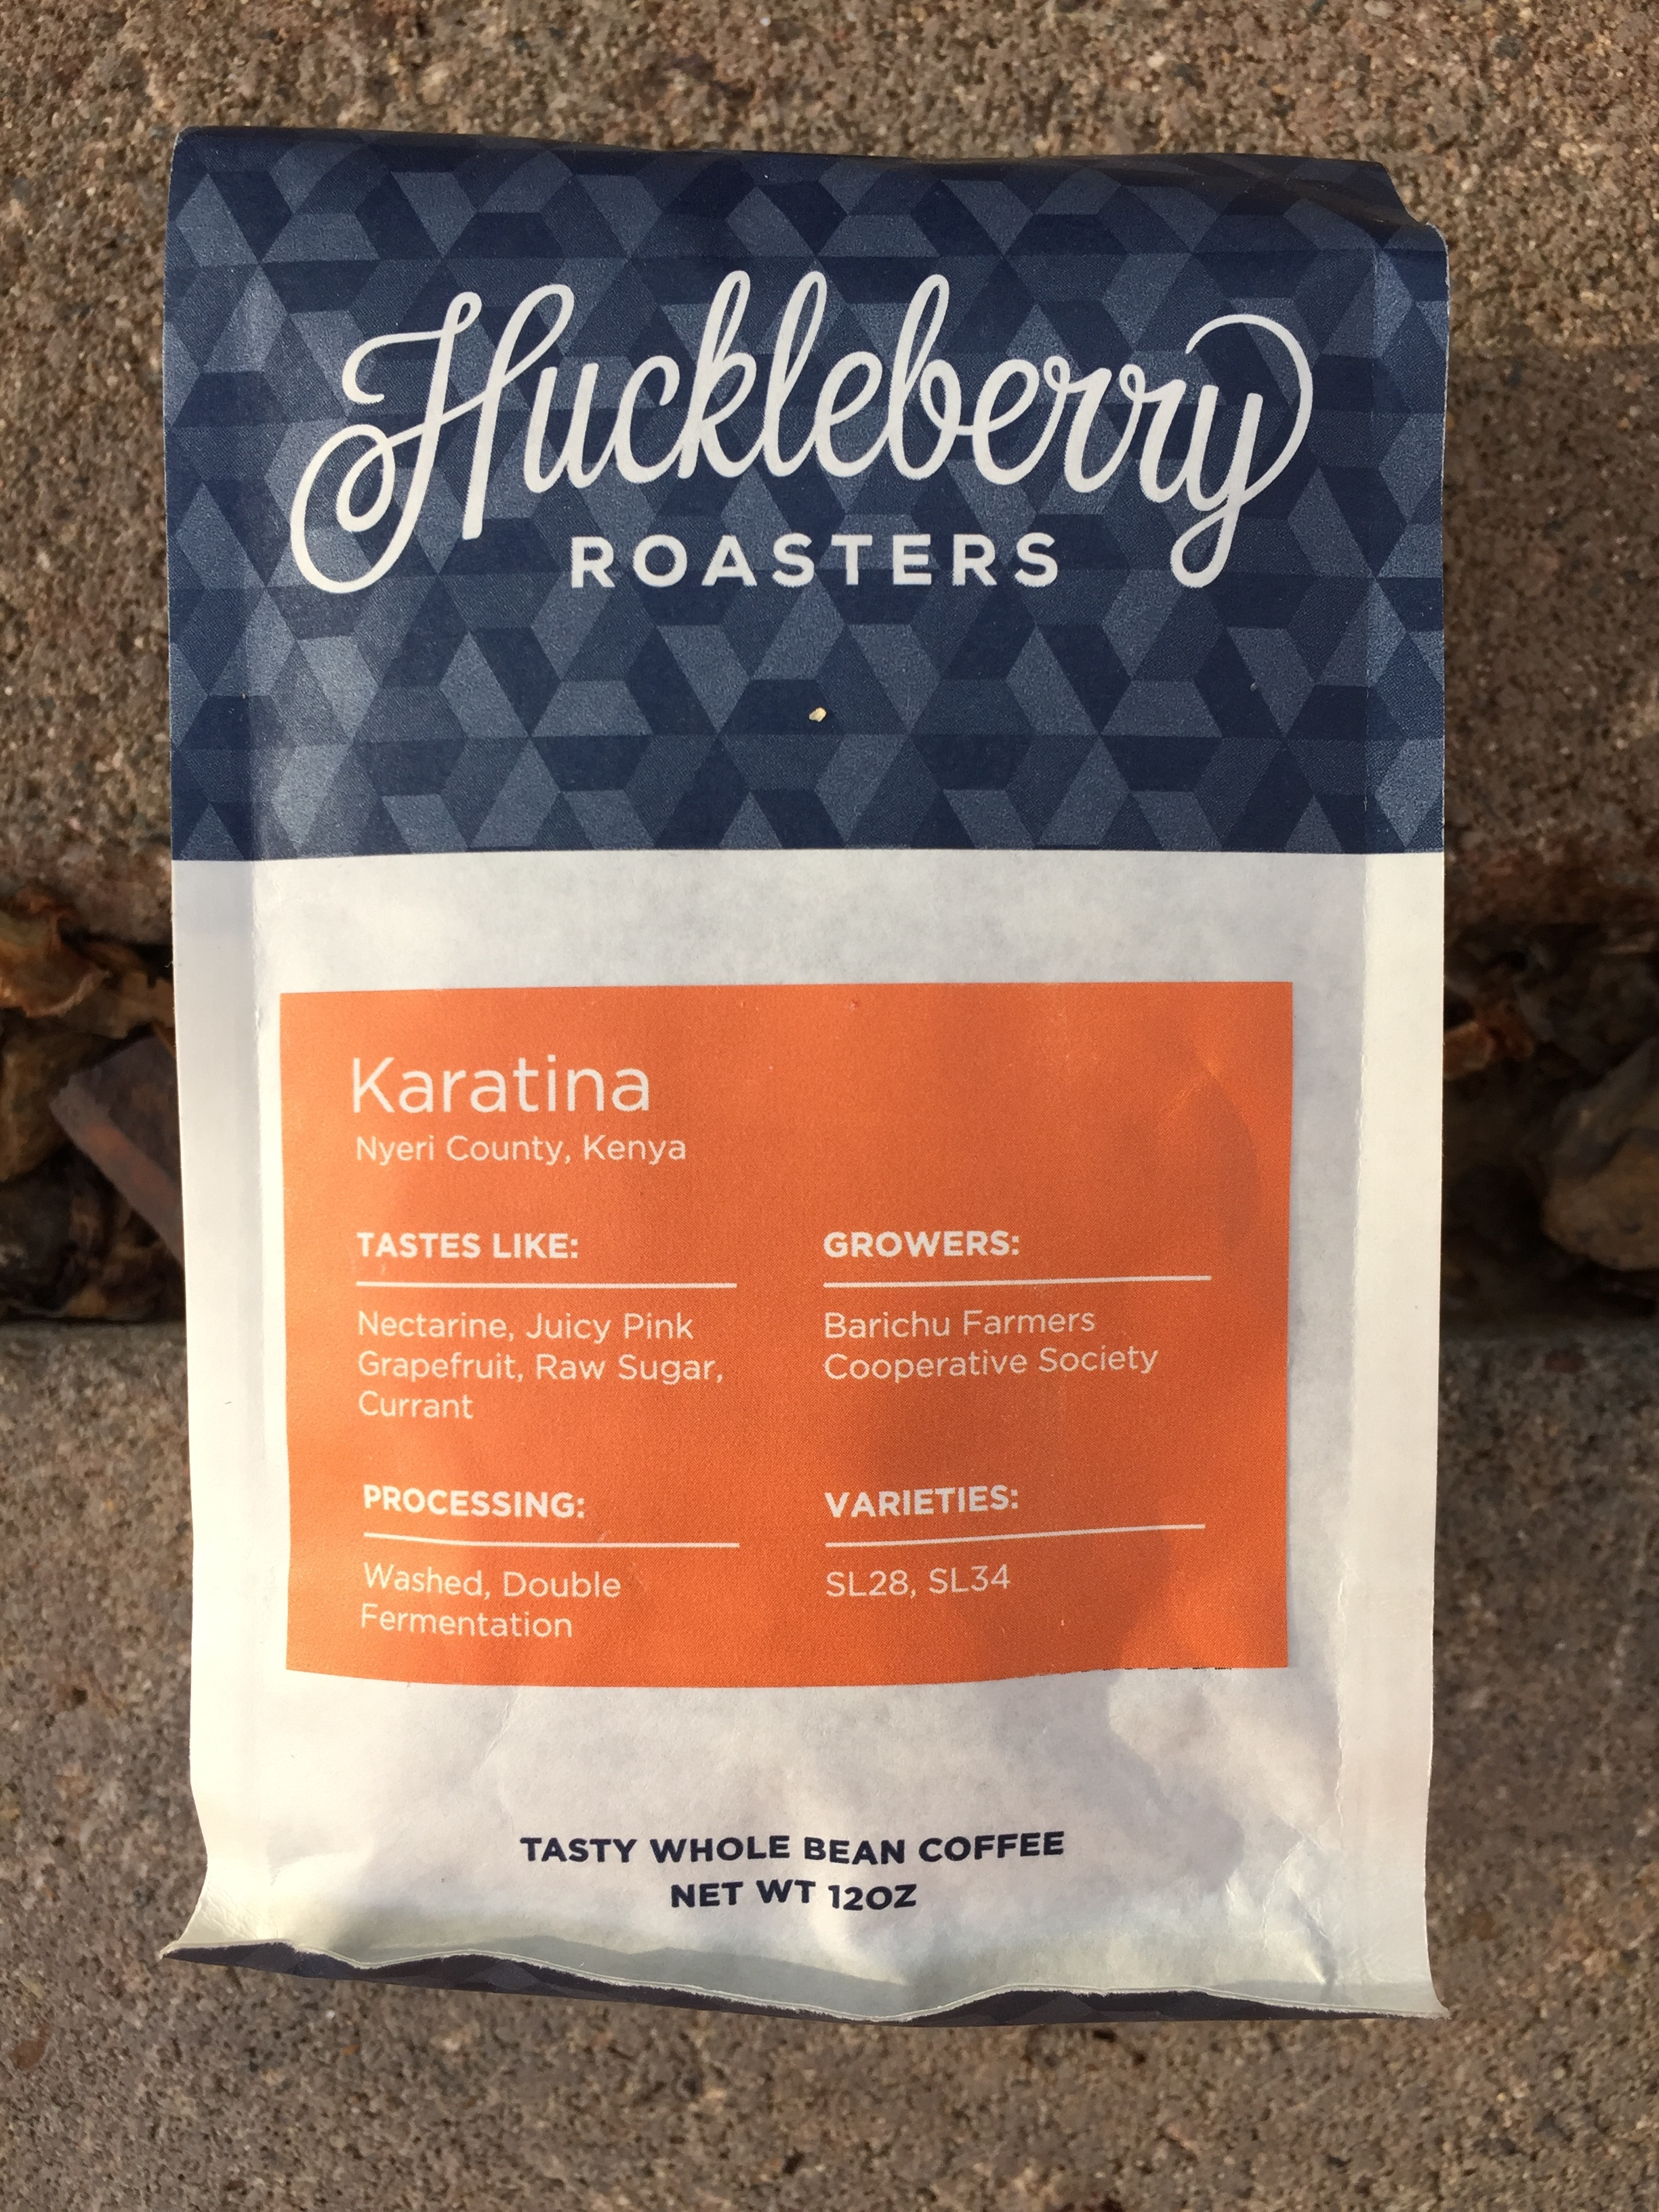 Huckleberry Roasters Kenya Karatina